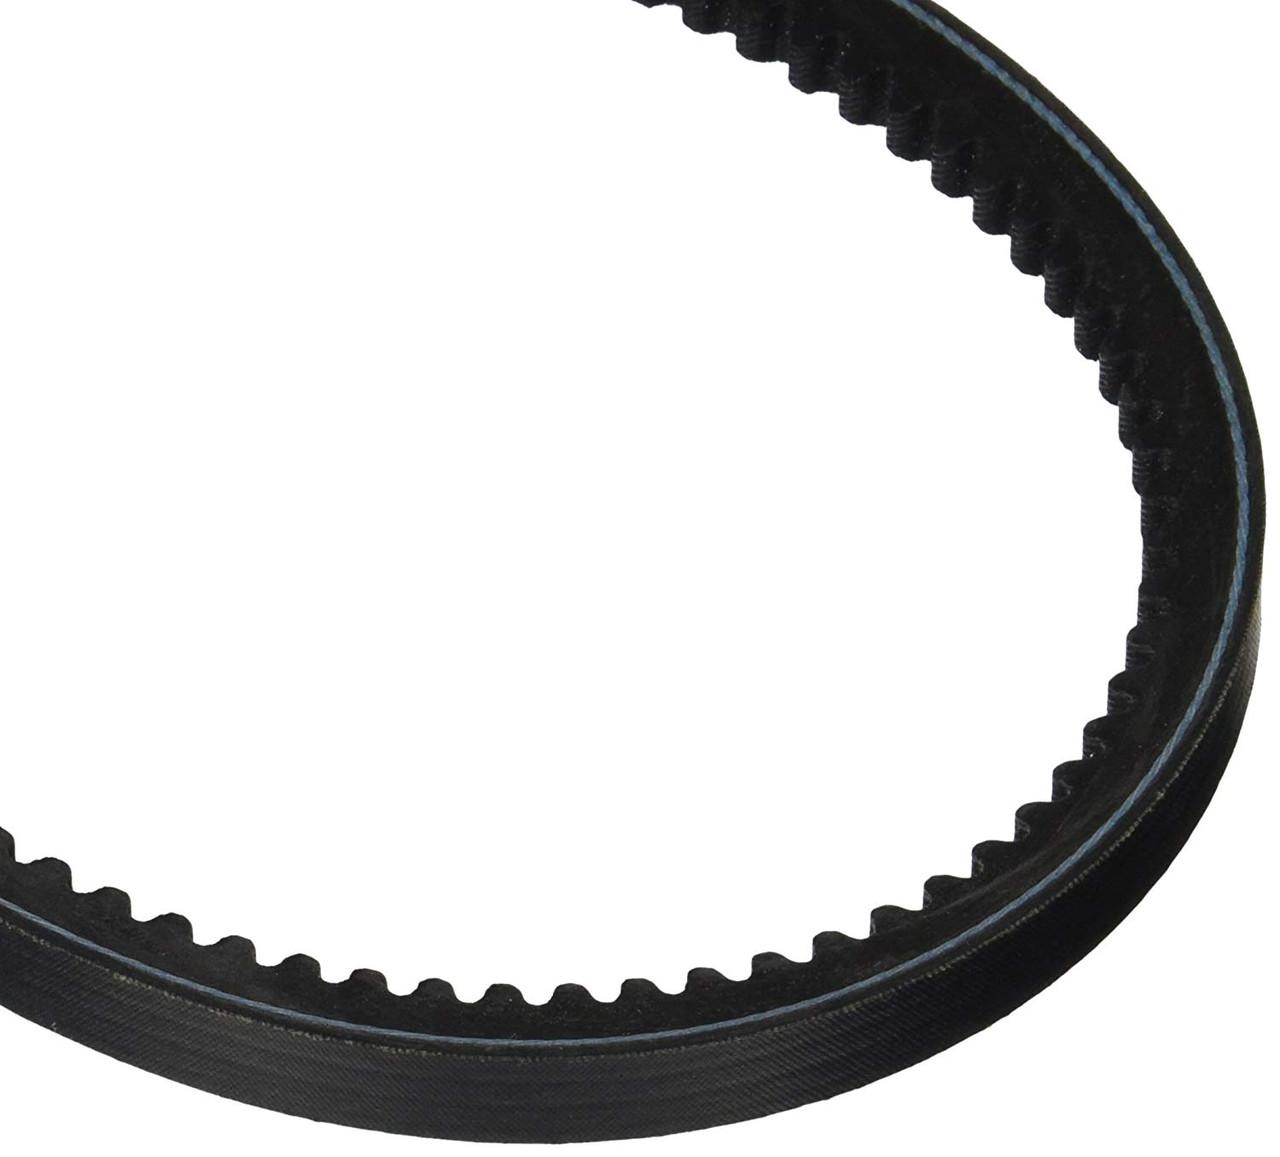 Gates 5VX690 Super HC®V-Belts